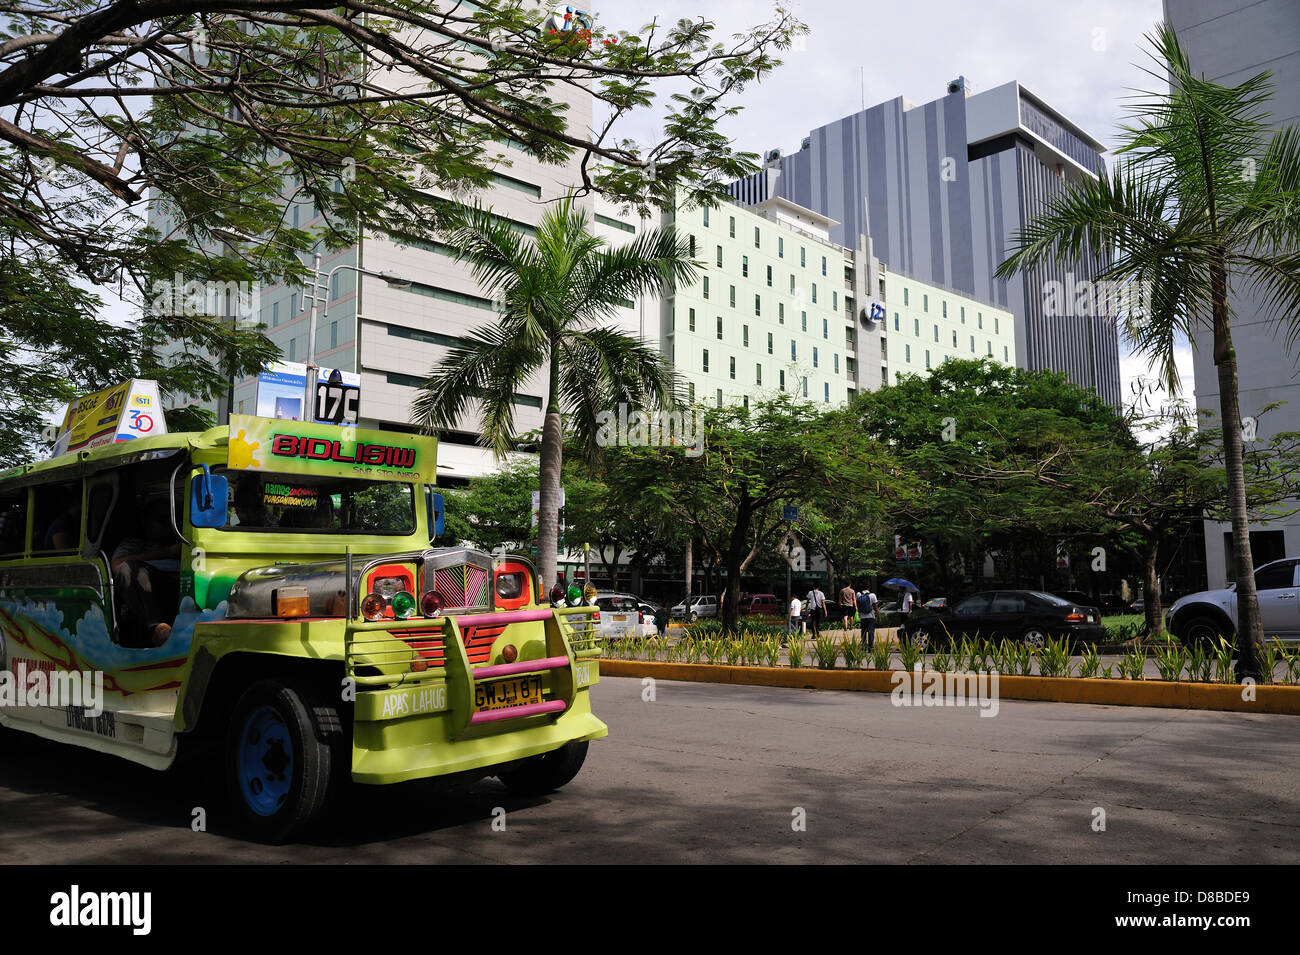 Jeepney I.T. Park Cebu City Philippines - Stock Image